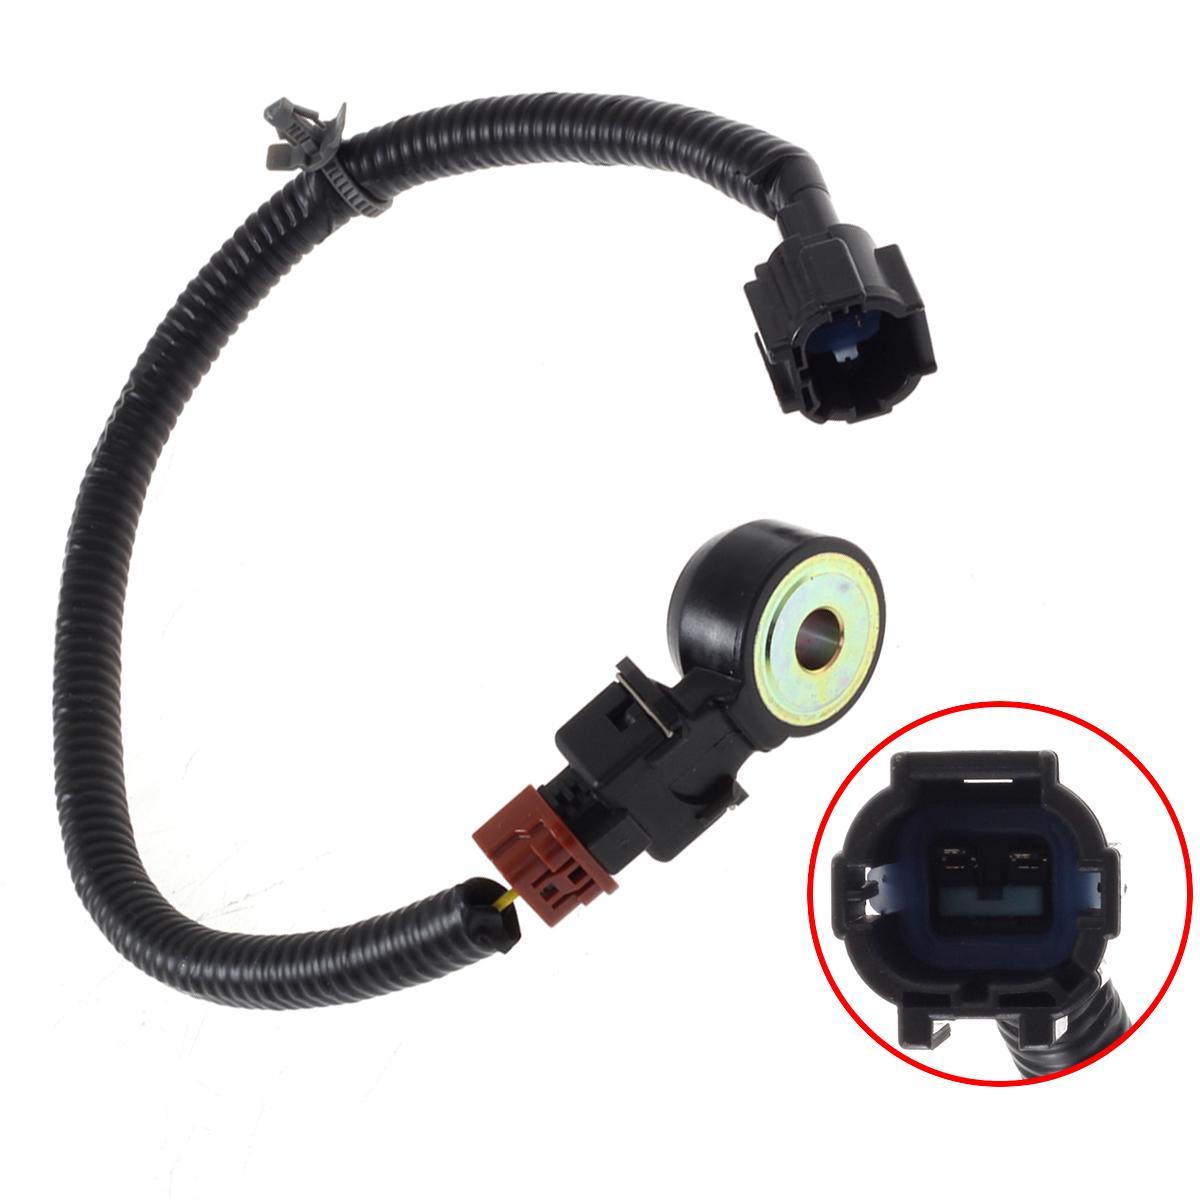 hight resolution of knock sensor wiring harness for 95 99 nissan maxima v6 3 0l 22060 30p00 ks79